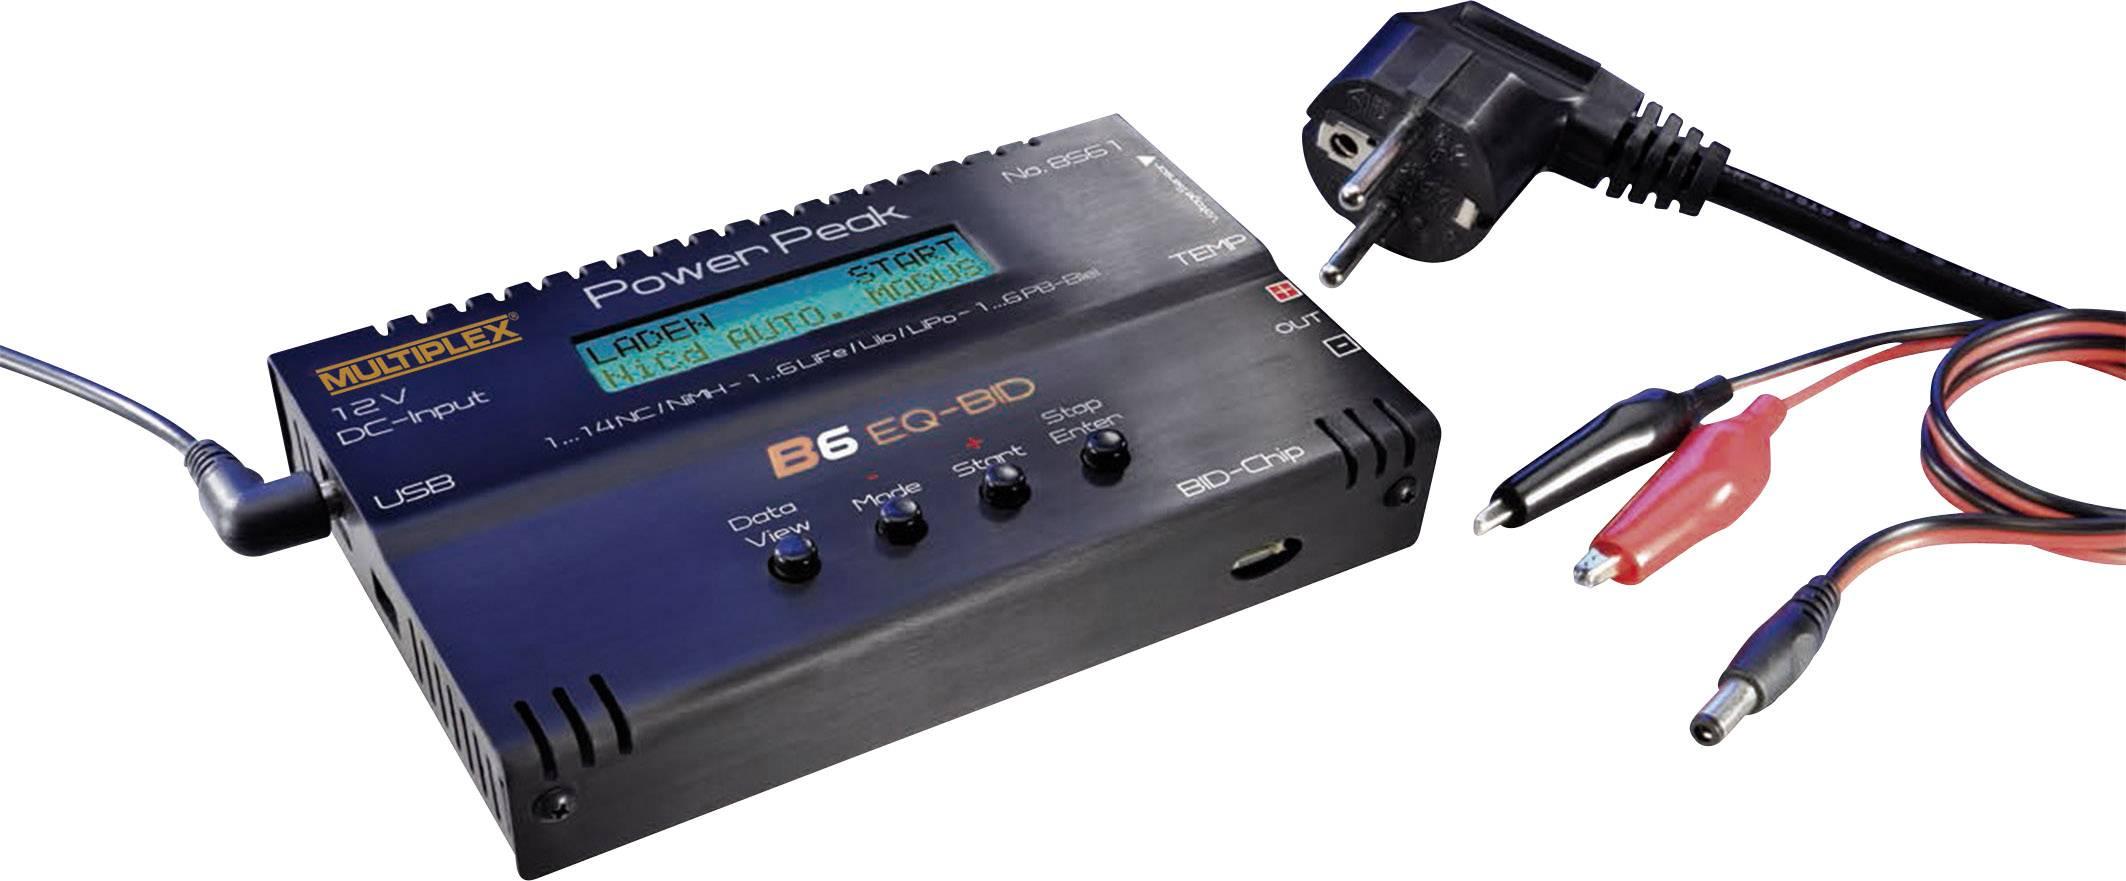 Modelárska multifunkčná nabíjačka Power Peak B6 EQ-BID 308561, 12 V, 220 V, 5 A